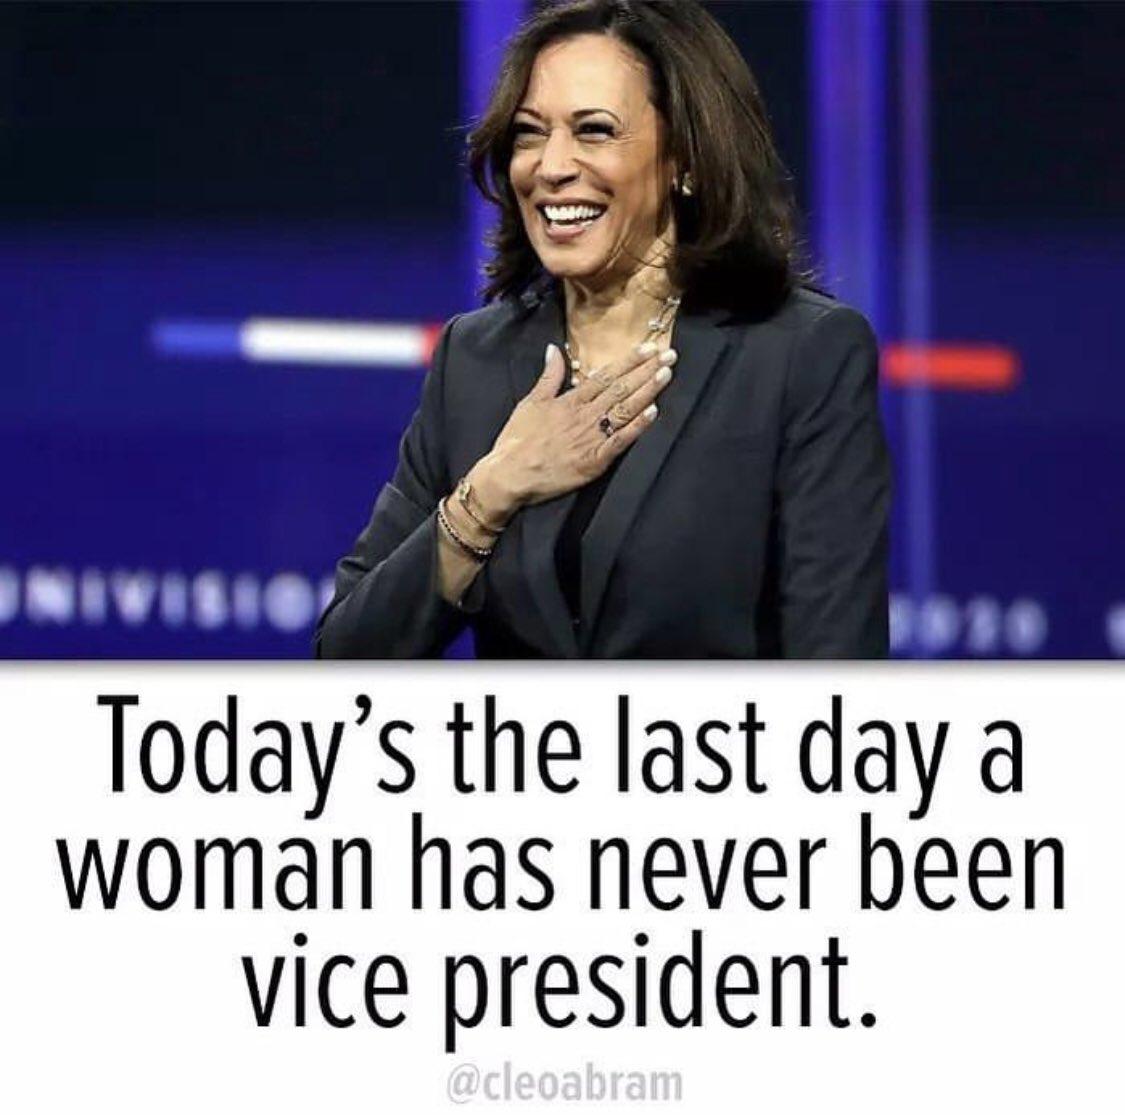 Headed to bed with so much hope for tomorrow! It's a beautiful time to be a woman! 💙💙 @JoeBiden @KamalaHarris #BidenHarrisInauguration #BidenHarris2020 #InaugurationDay #PresidentElectBiden #Inauguration2021  #2020PresidentialElection #KamalaHarris #VicePresidentHarris